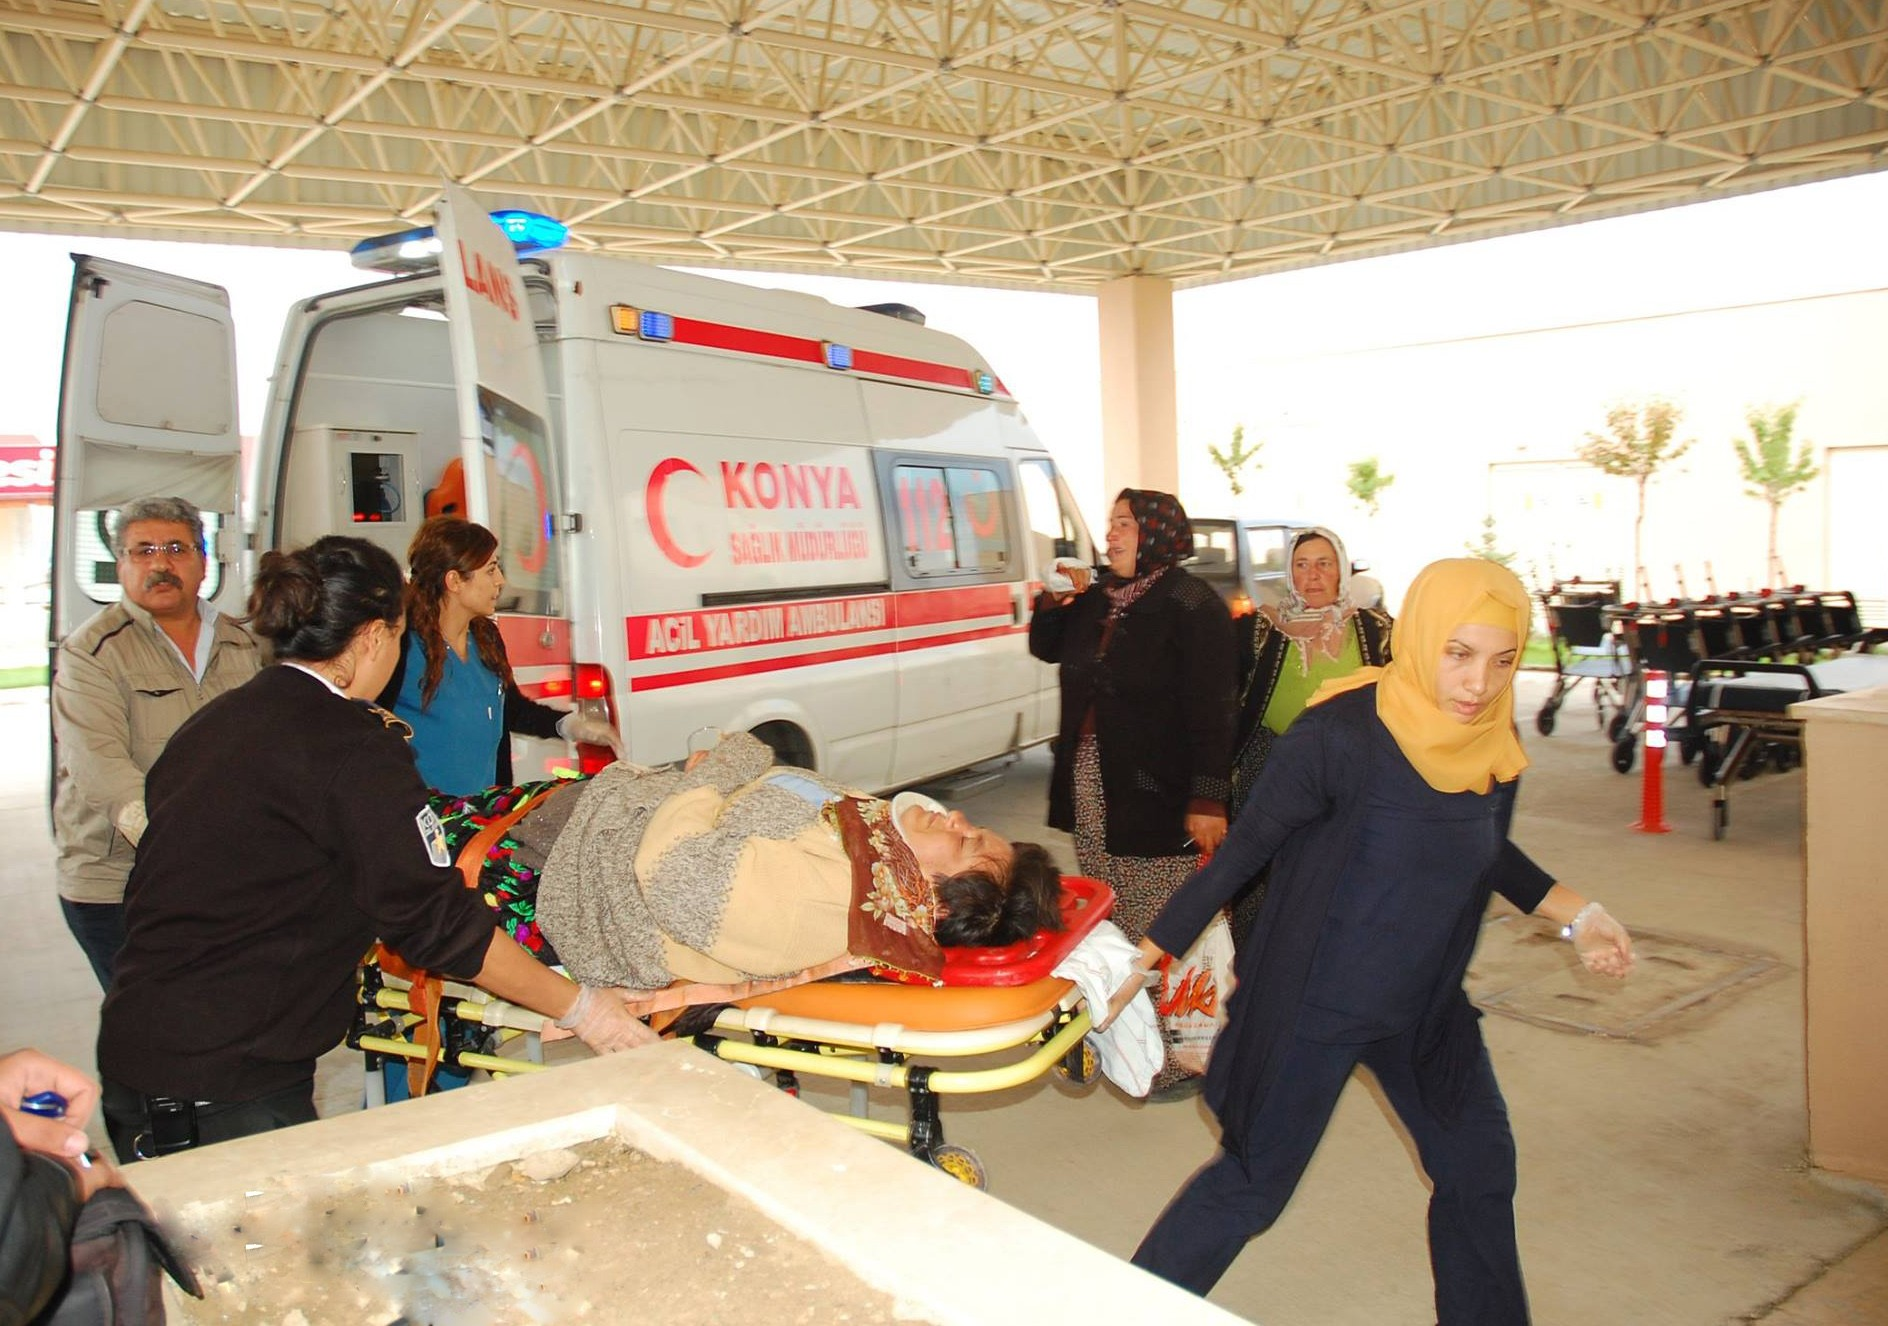 Elma işçilerini taşıyan midibüs devrildi: 29 yaralı